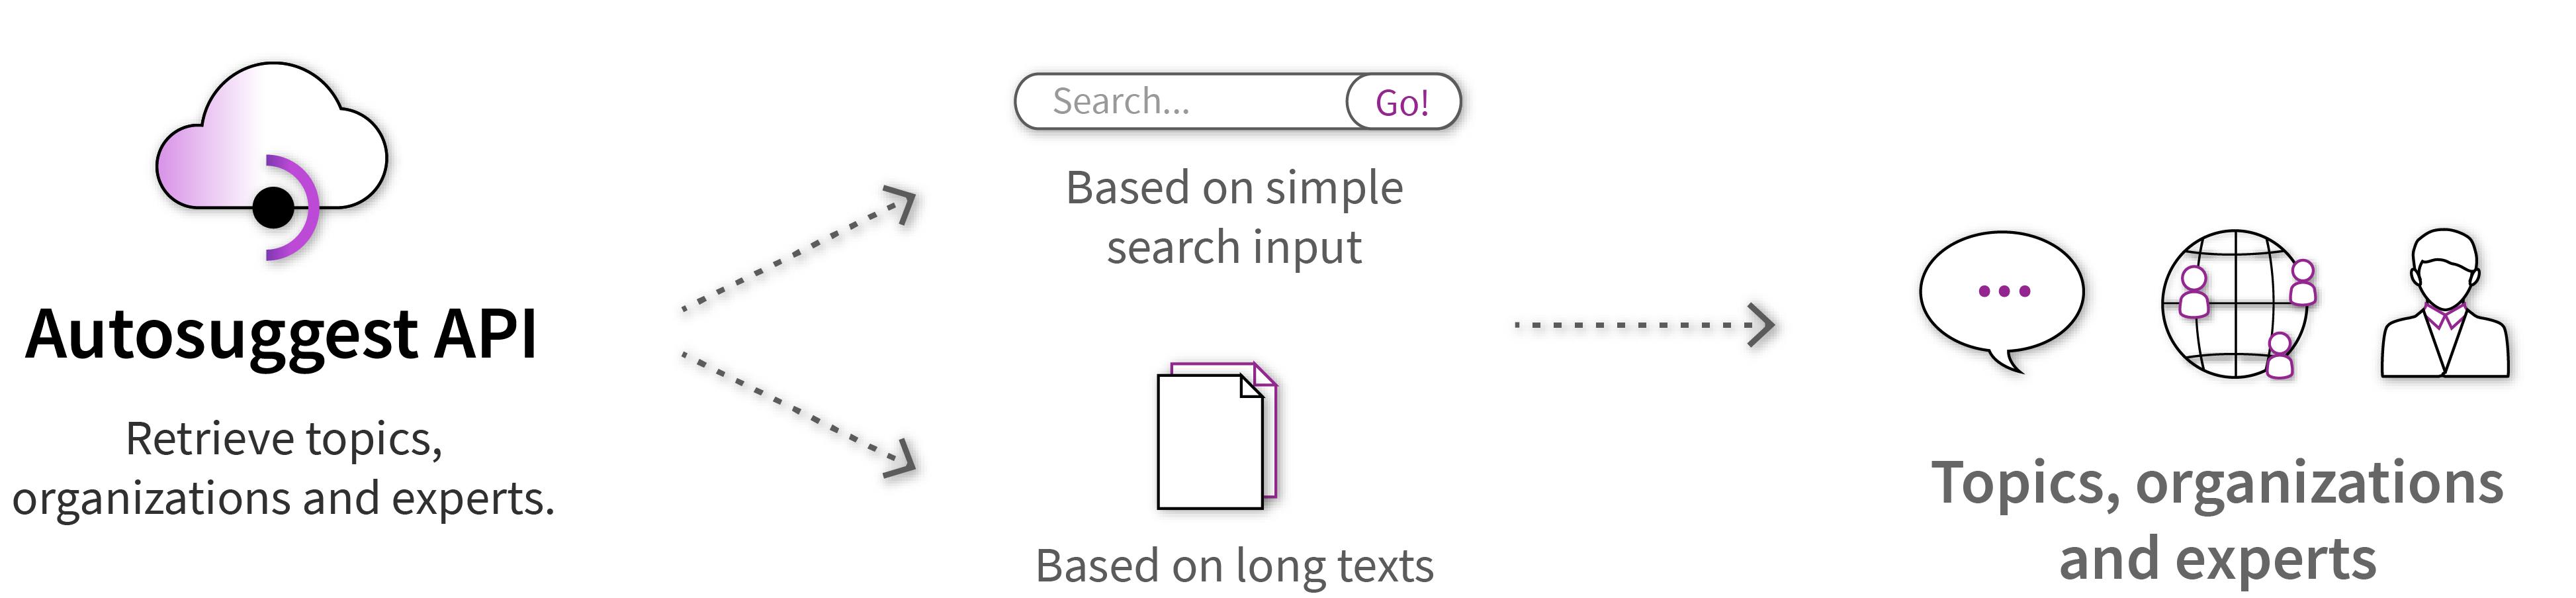 Autosuggest API